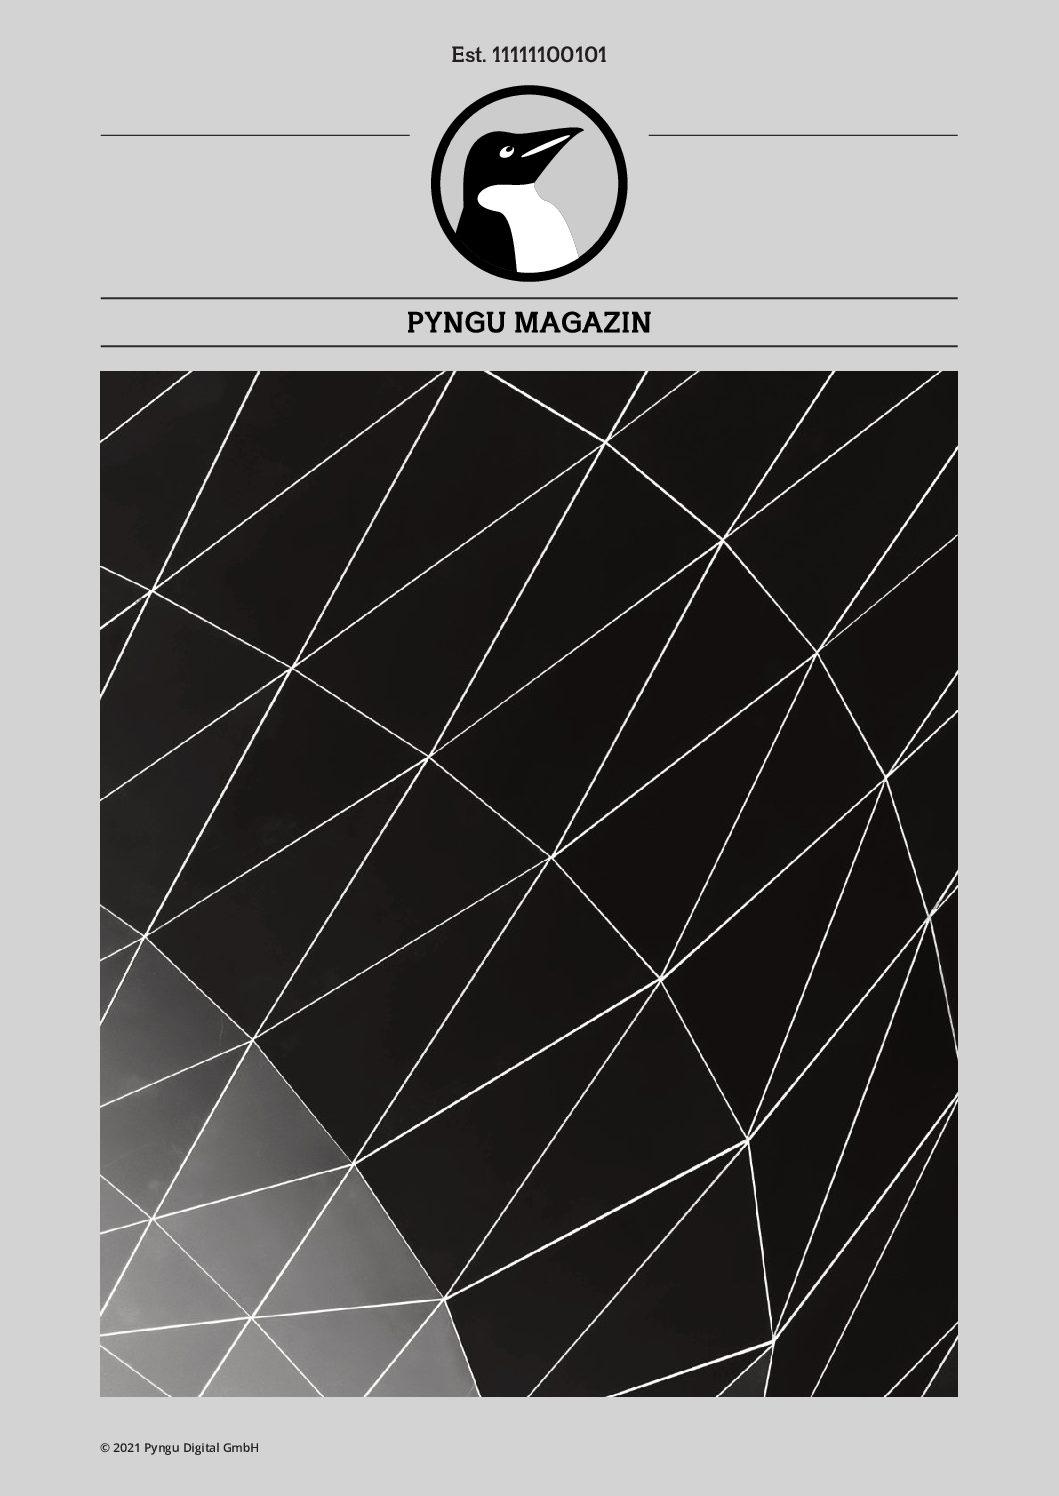 Pyngu Mag Titelseite pdf